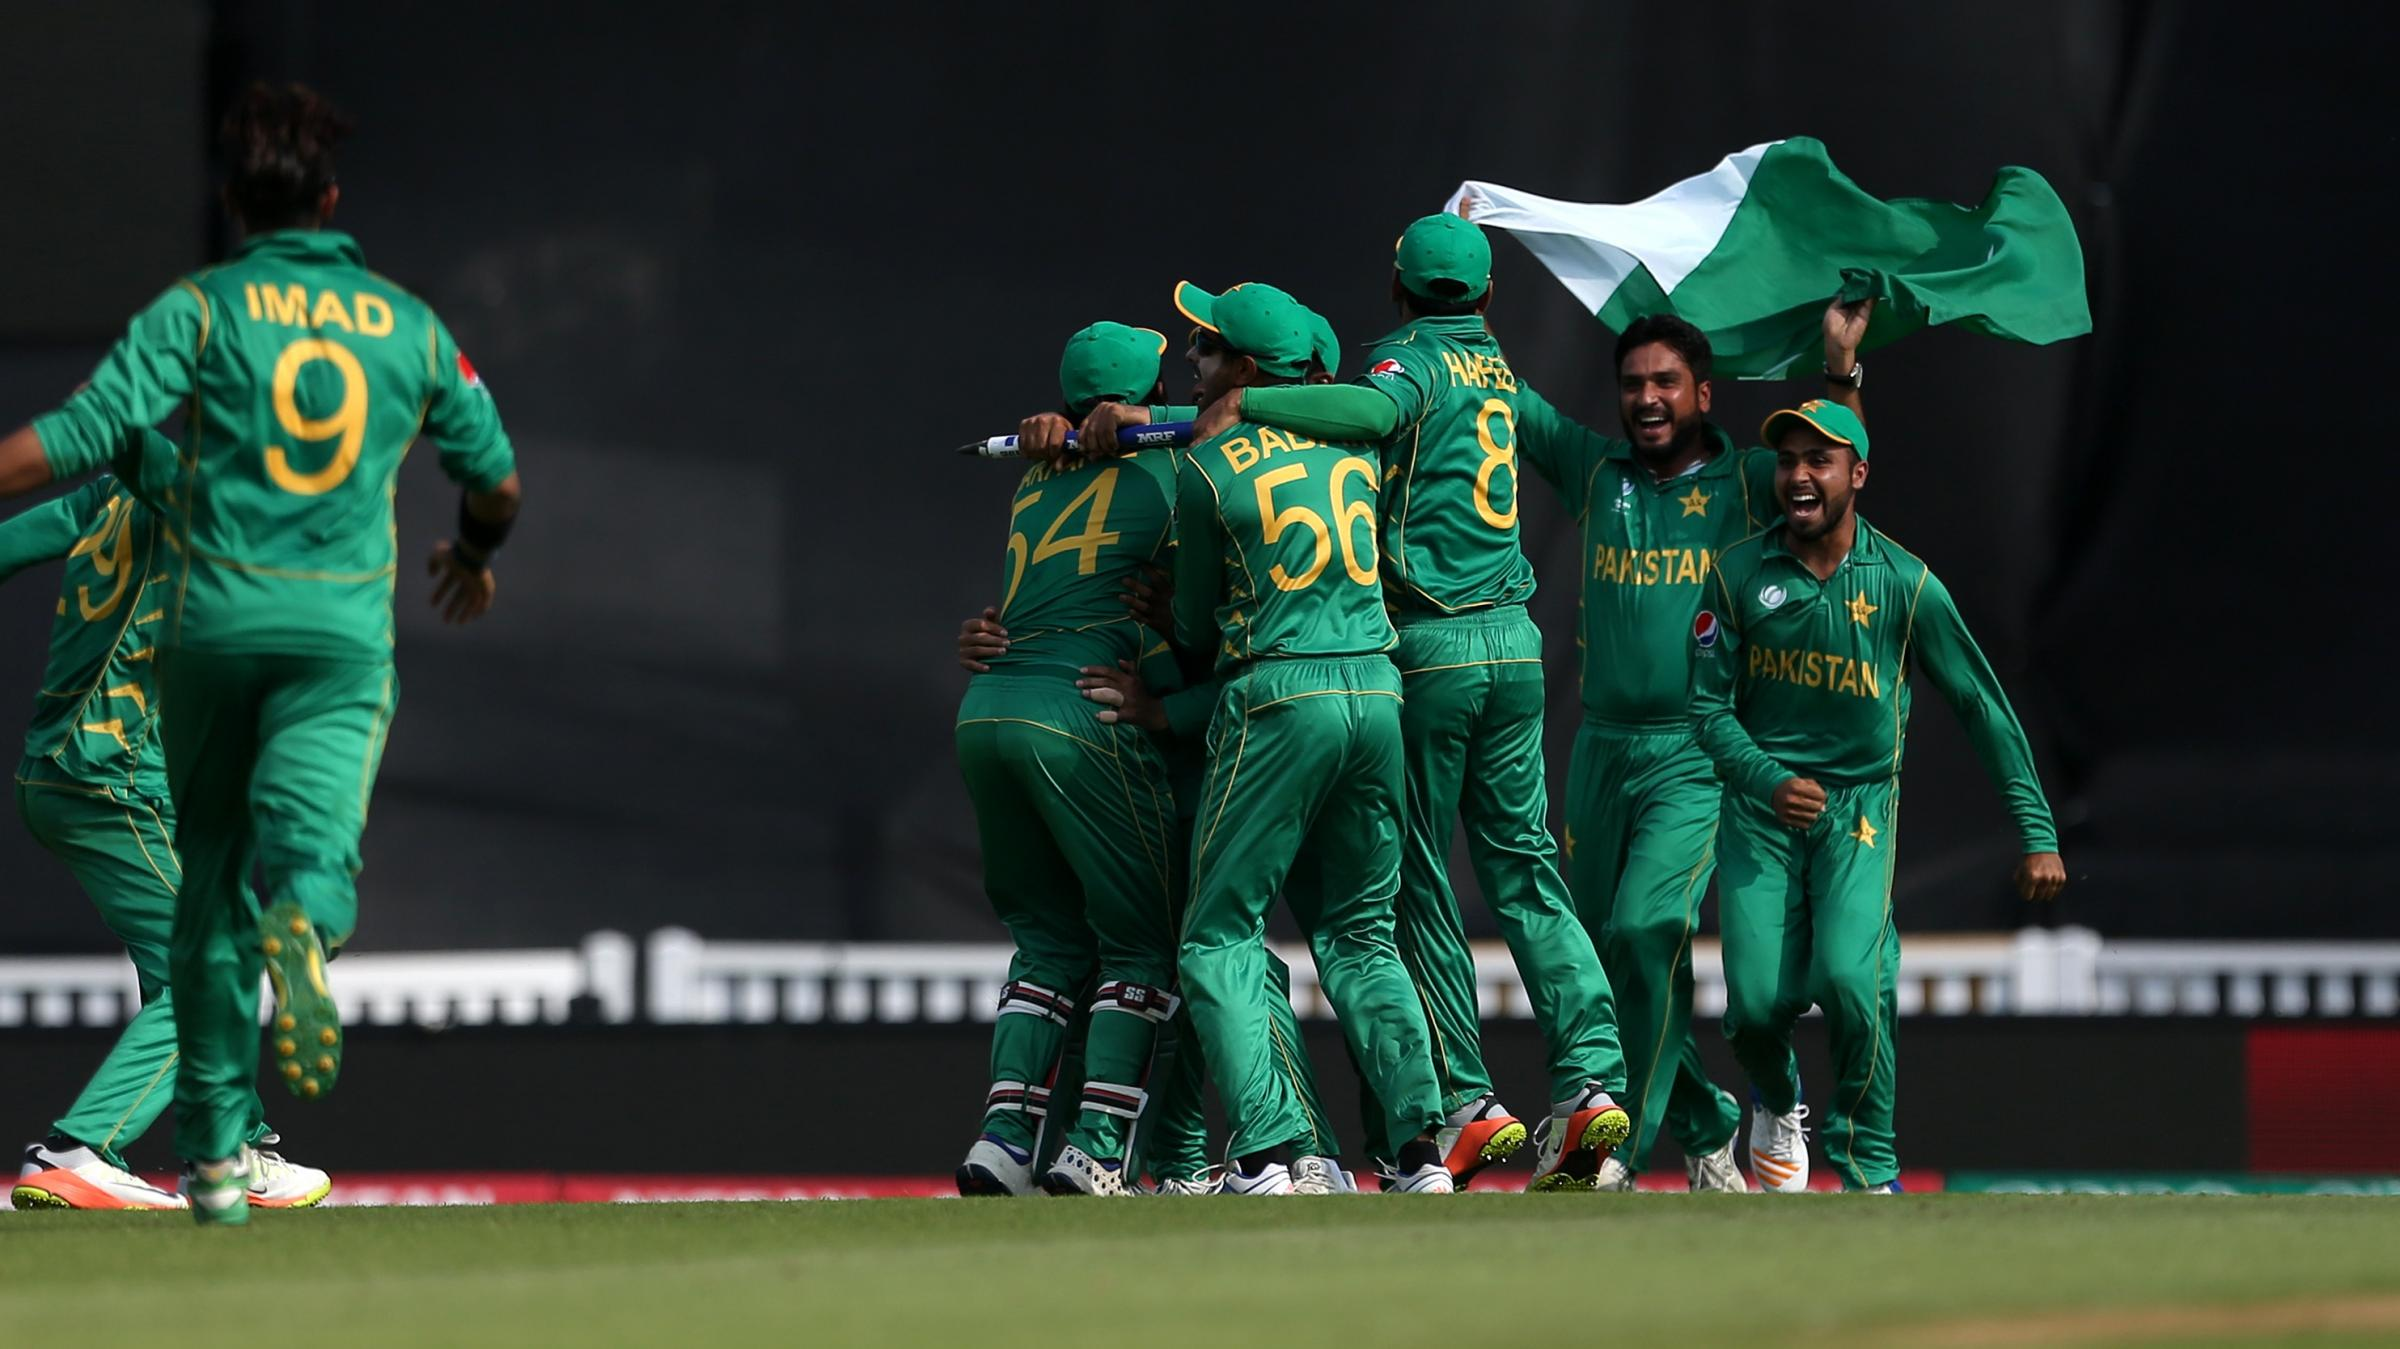 ICC Champions Trophy Final: India Vs Pakistan: Hatke Player of the Match